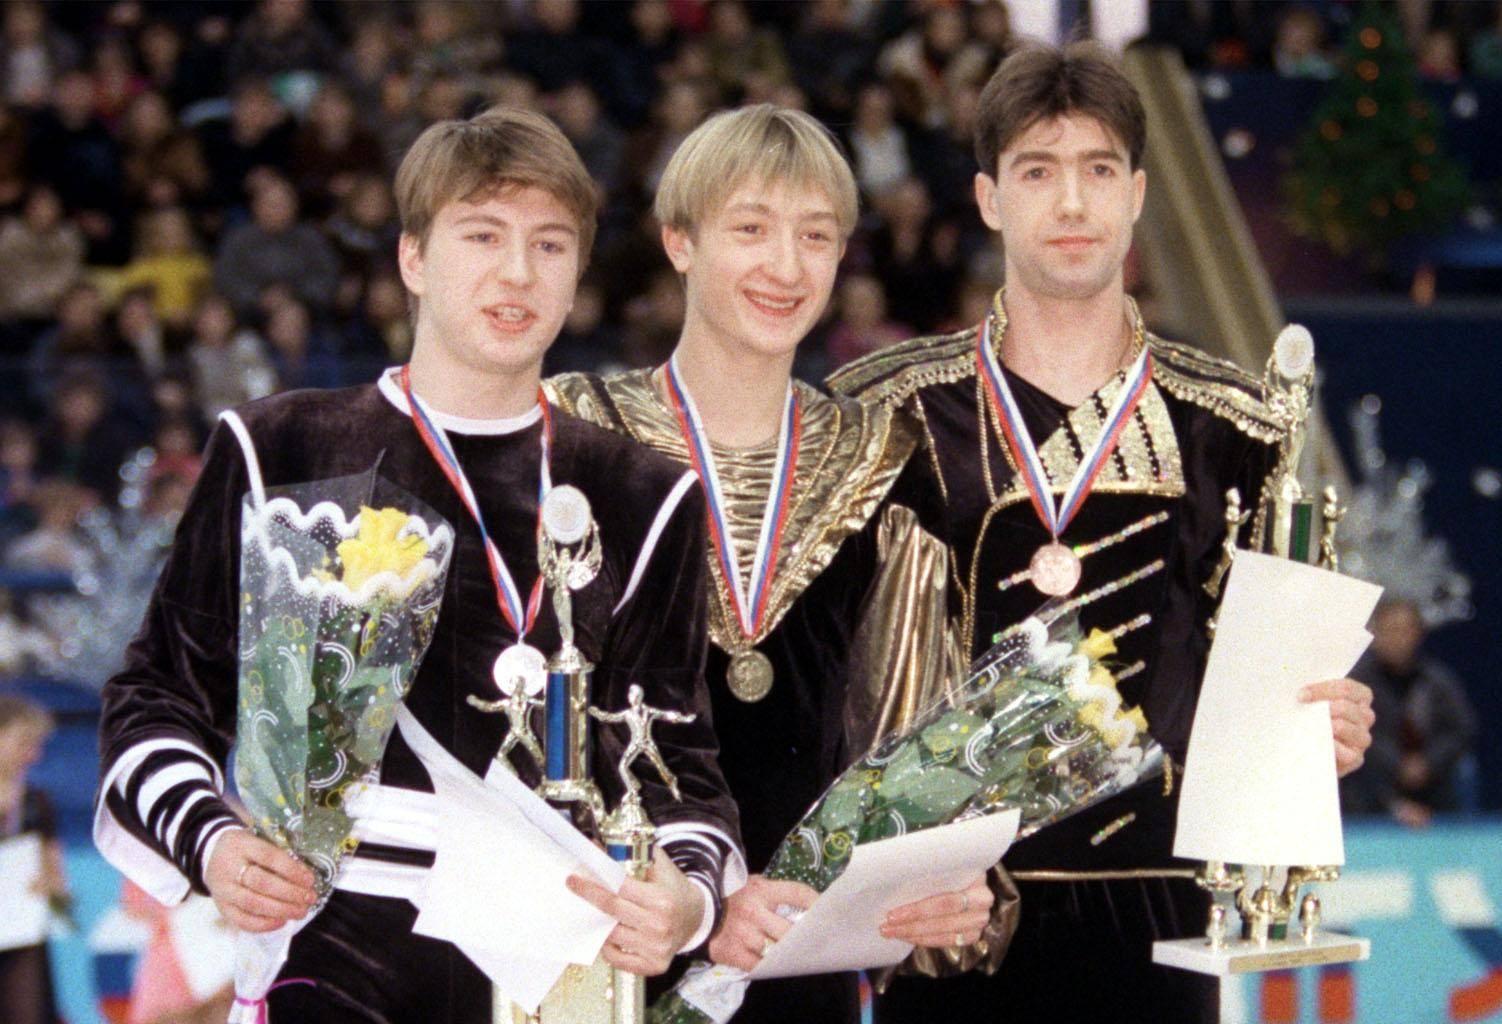 Ягудин (2-е место), Плющенко (1-е место) и Урманов (3-е место) — призёры чемпионата России 1999 года. Фото © ИТАР-ТАСС / Игорь Уткин